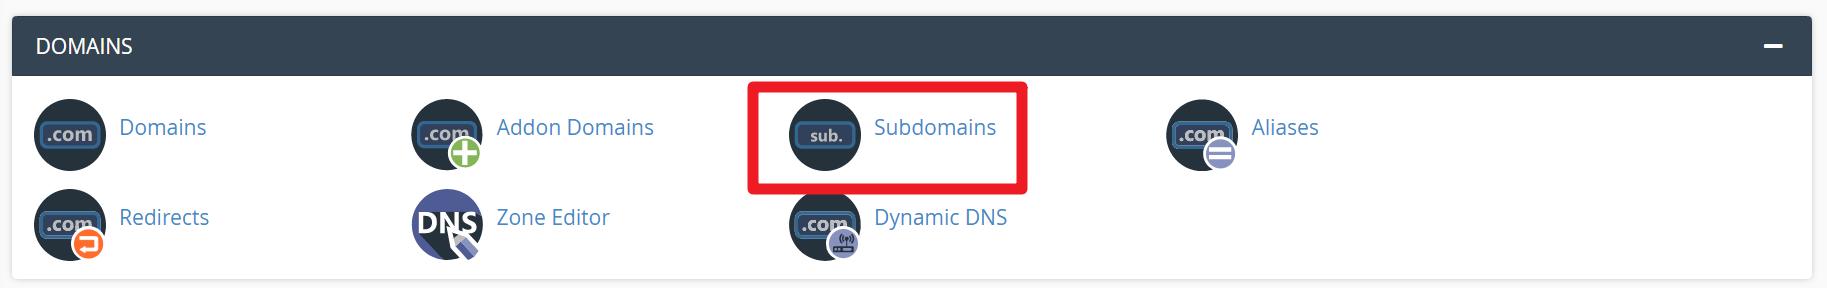 add subdomains in hostarmada - Hostarmada主机:优惠购买攻略、建站教程与速度评测